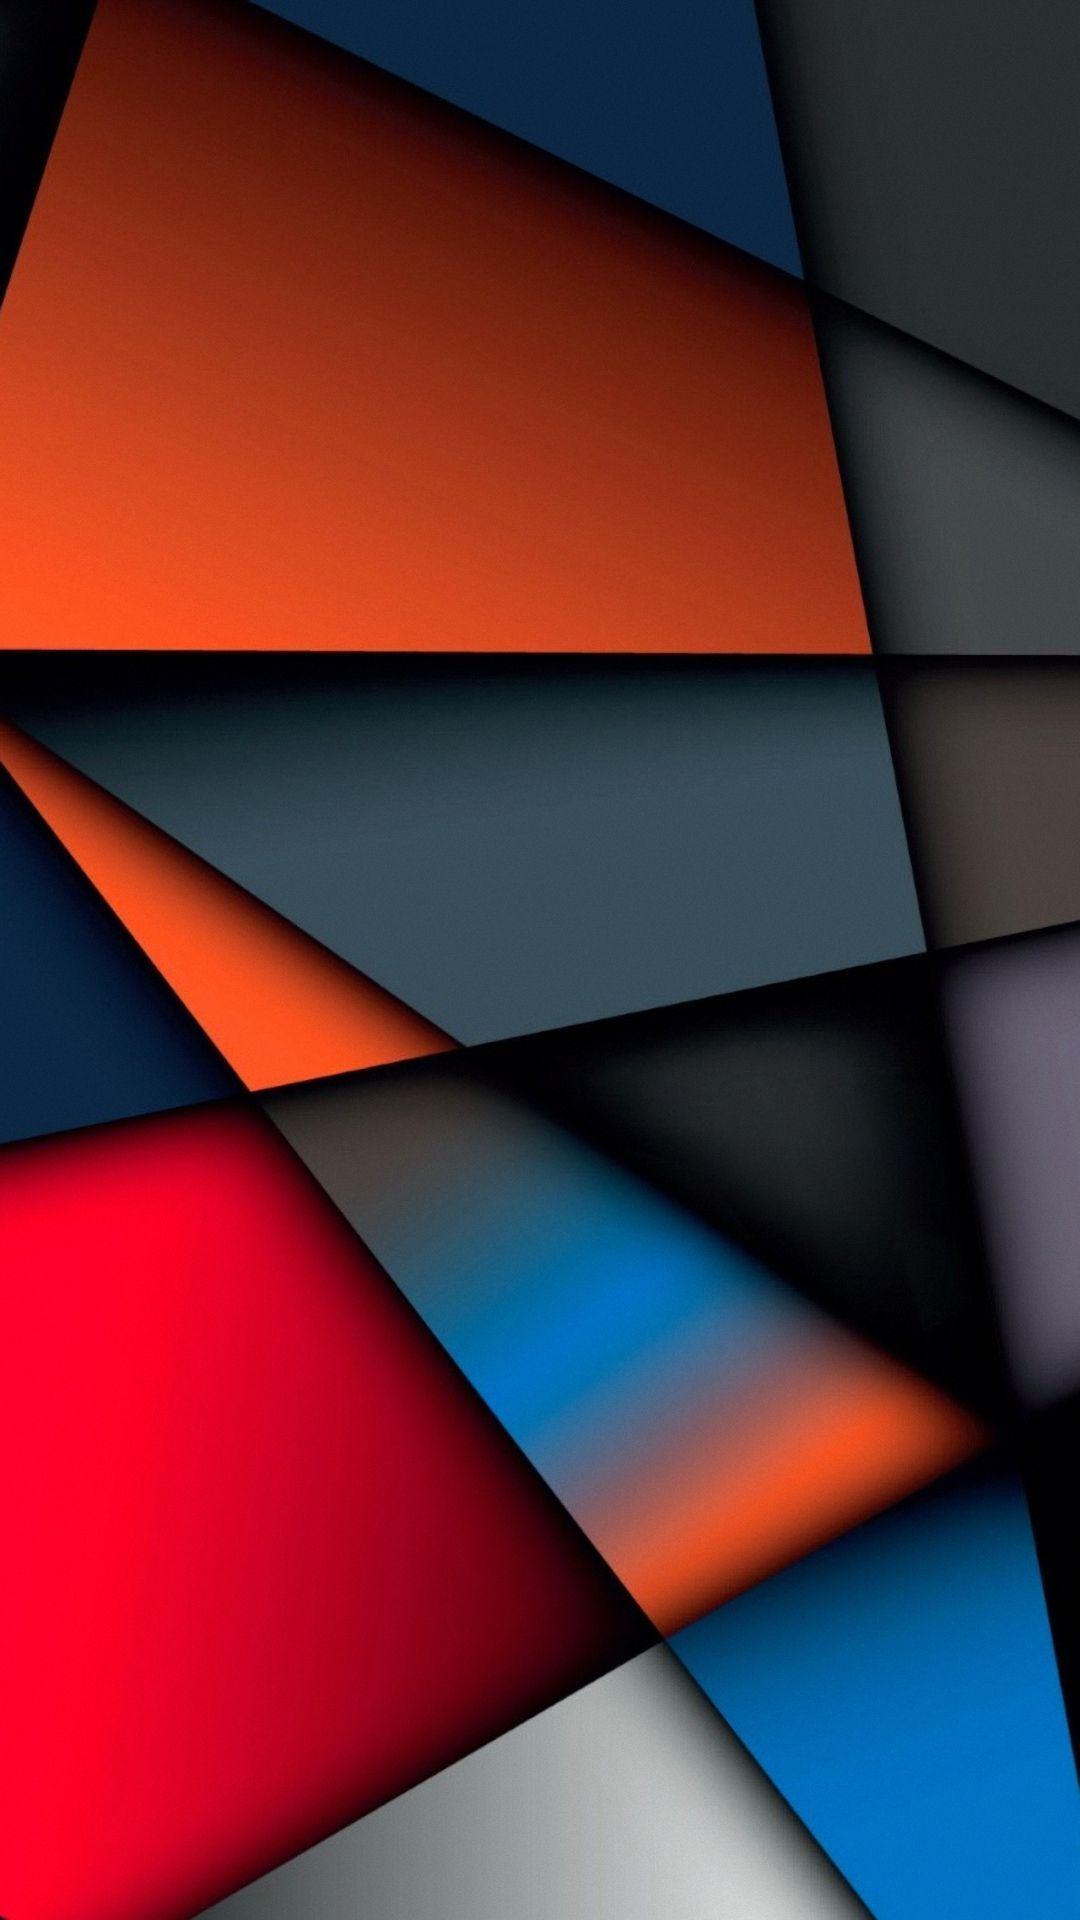 Ultra Hd 4k Wallpaper Google Search Waves Wallpaper Uhd Wallpaper 3840x2160 Wallpaper